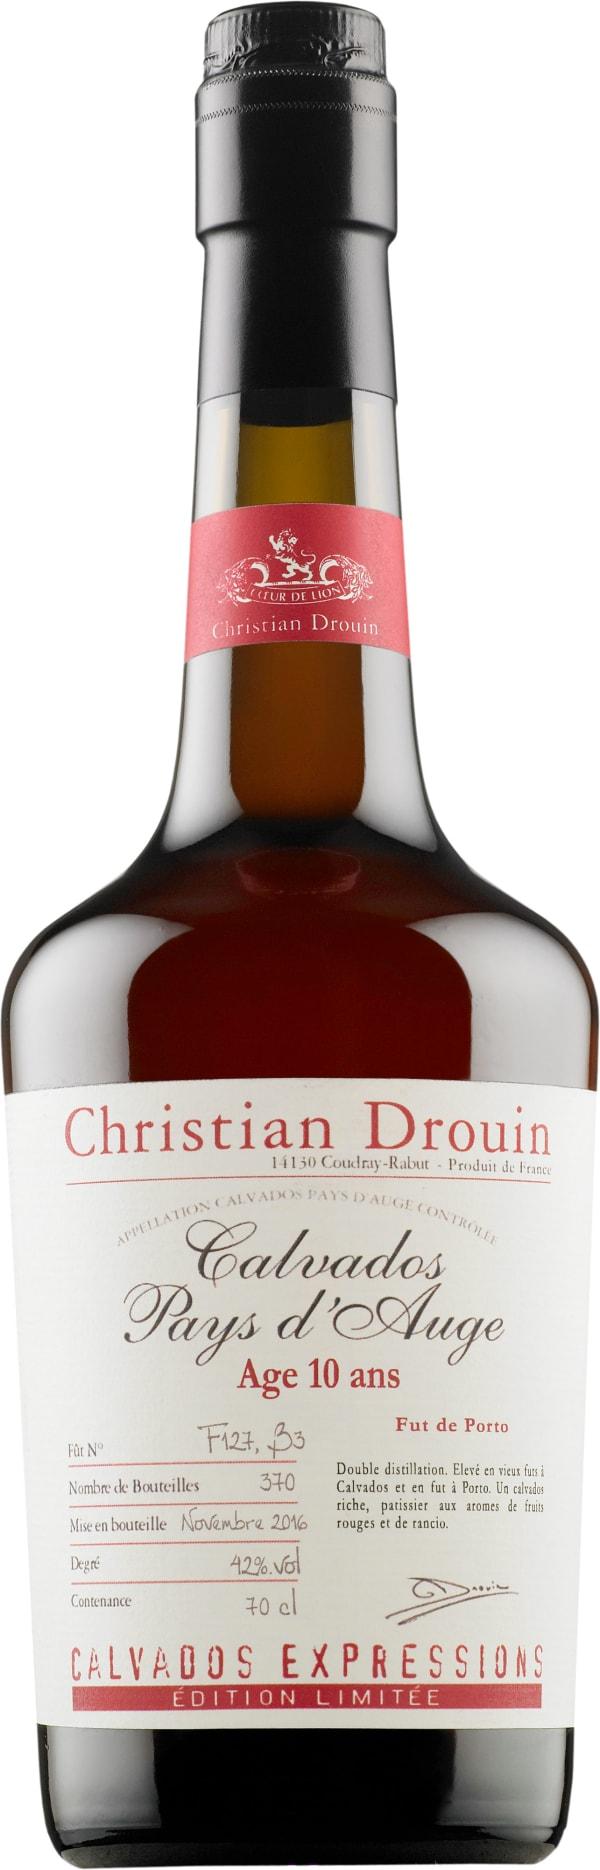 Christian Drouin 10 ans Fut de Porto Calvados